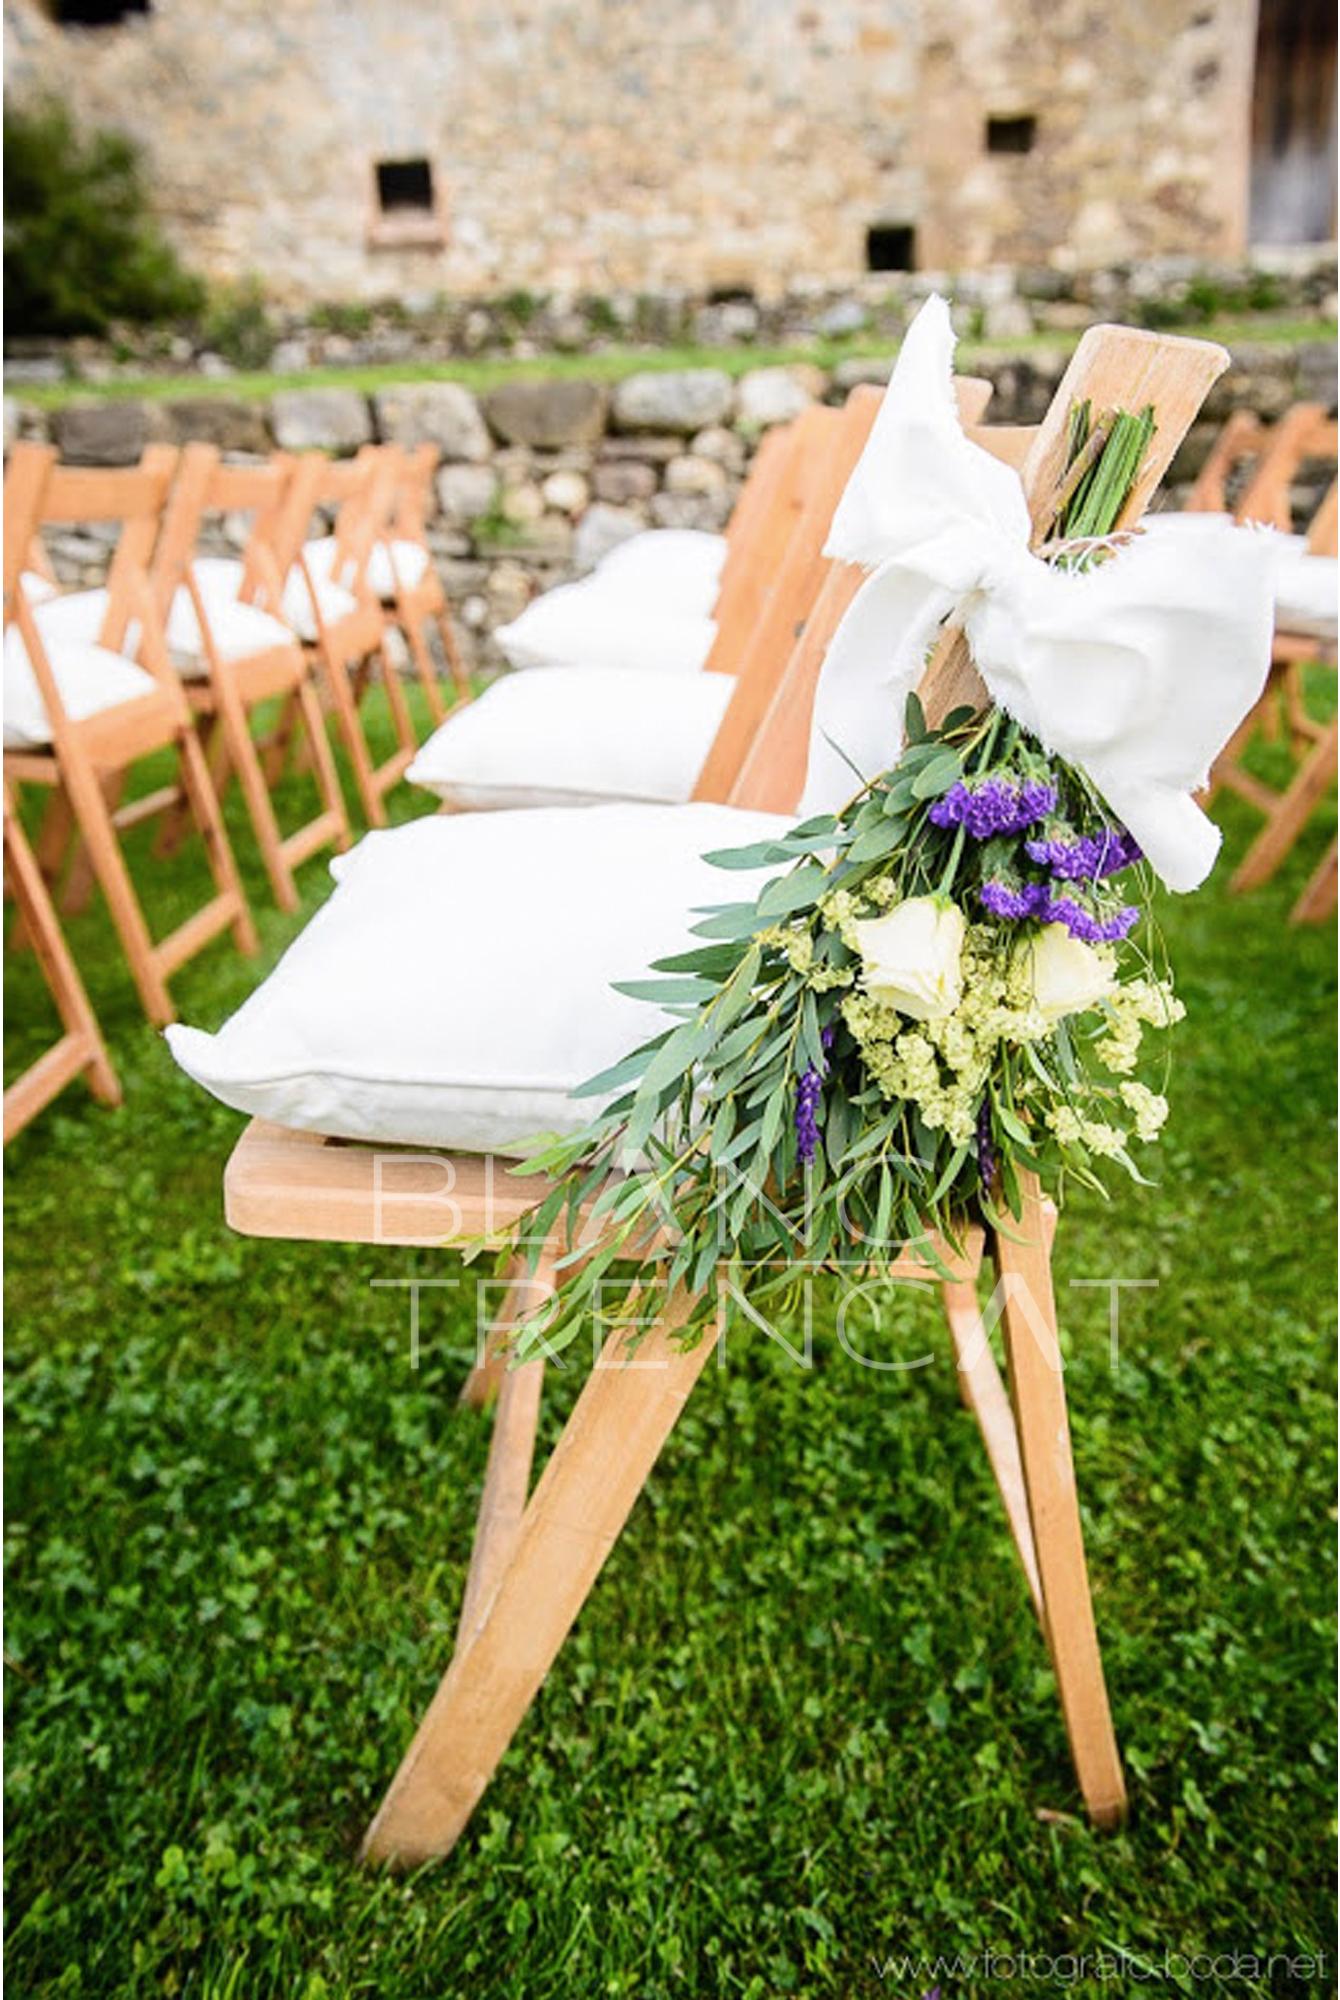 decoración boda_blanctrencat.jpg